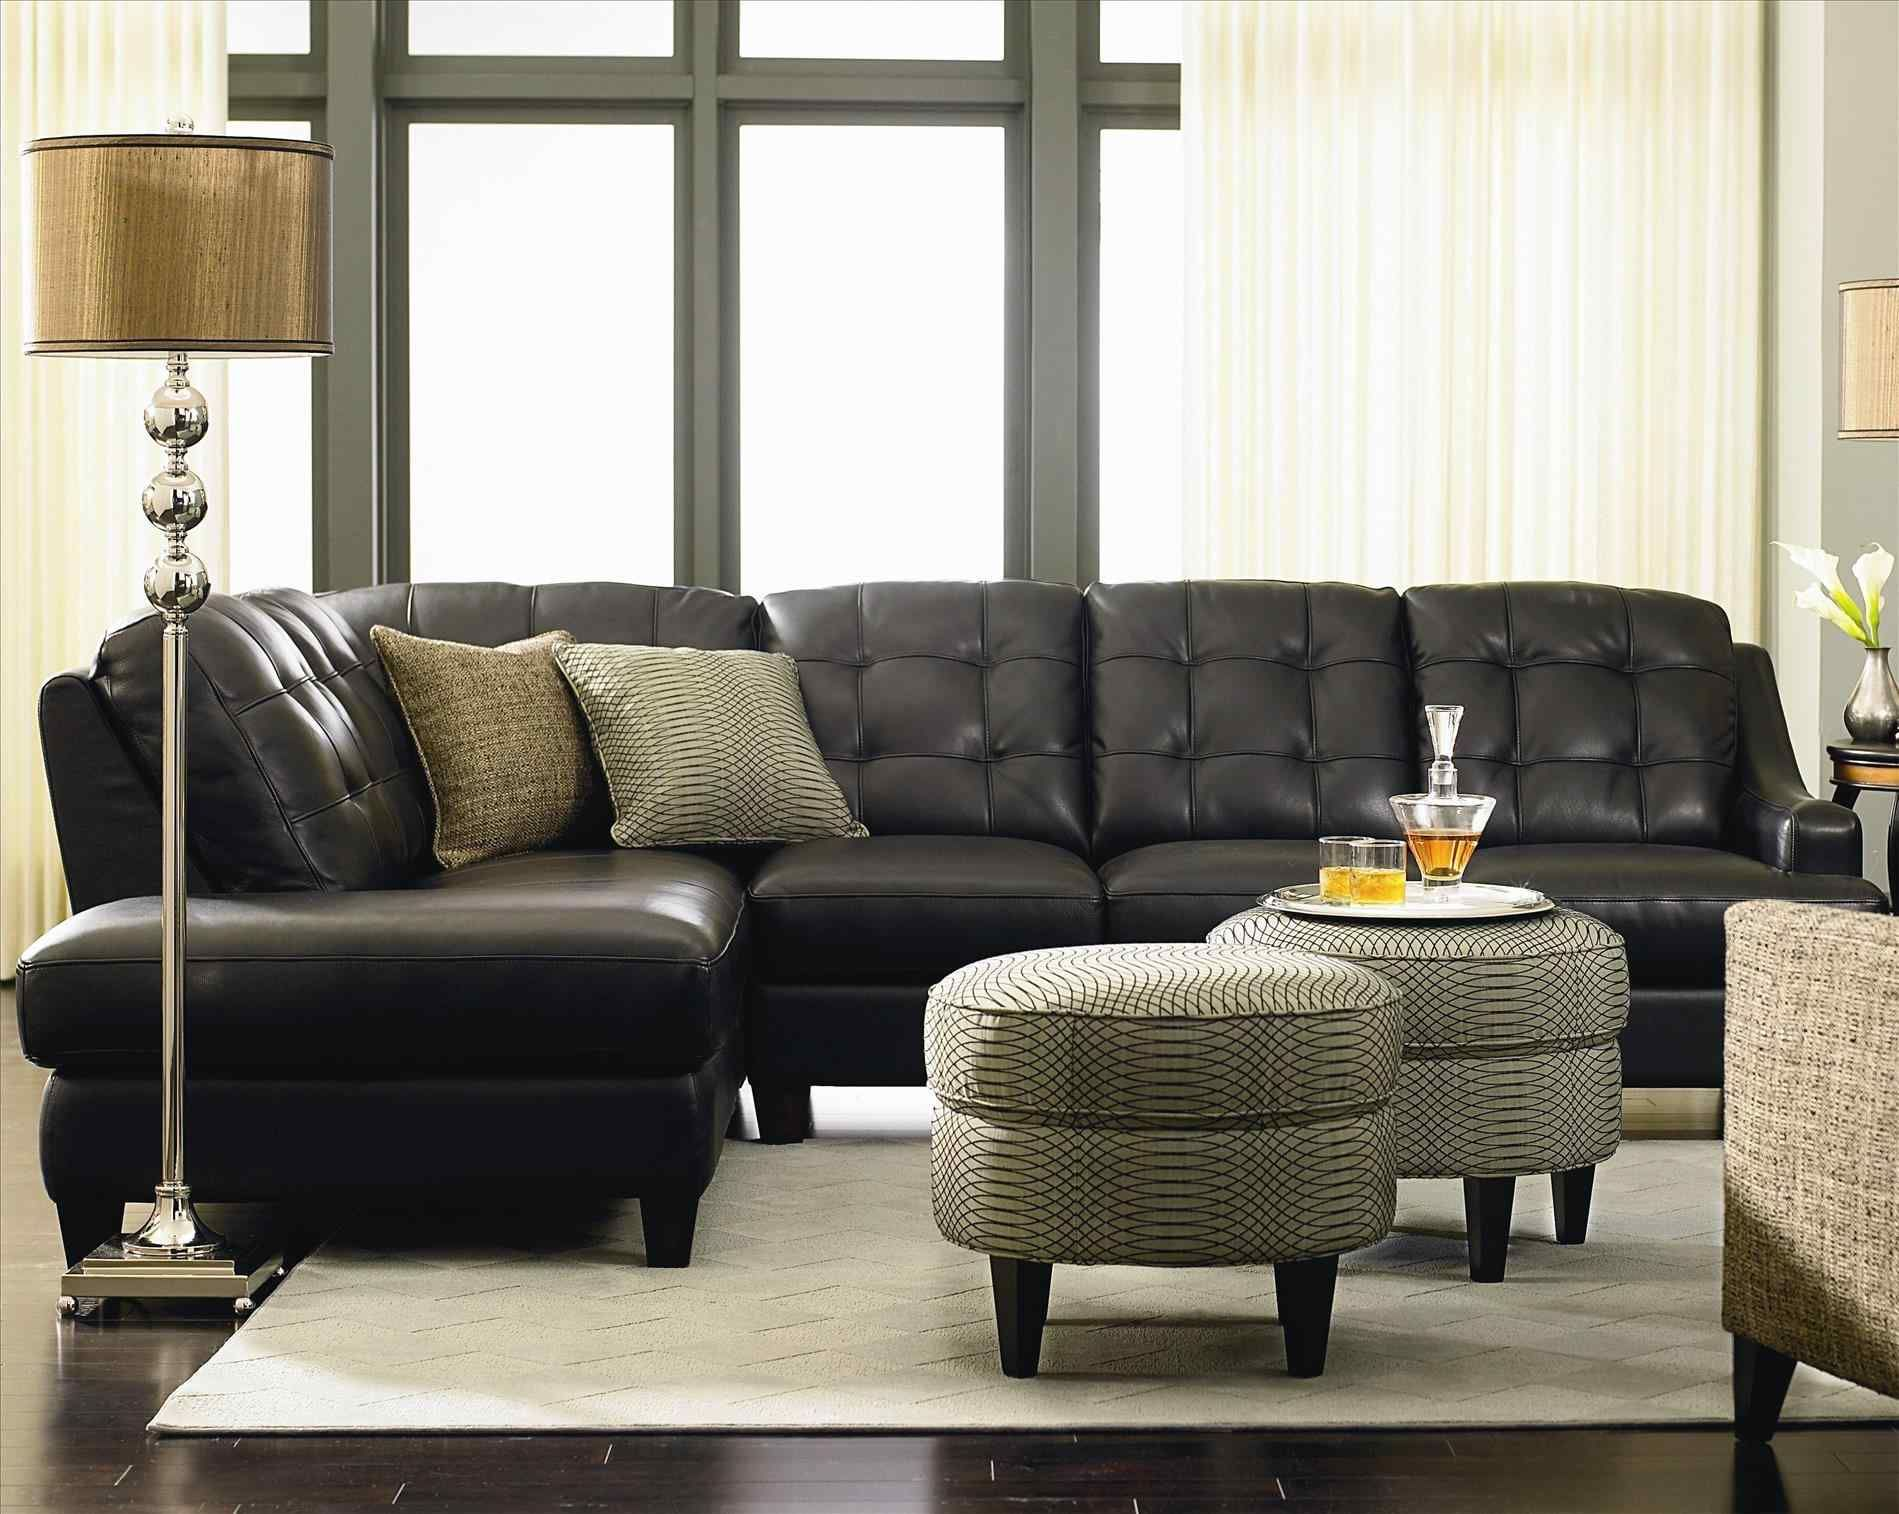 Hamilton Bassett Sectional Sofa Reviews Traditional Lshaped